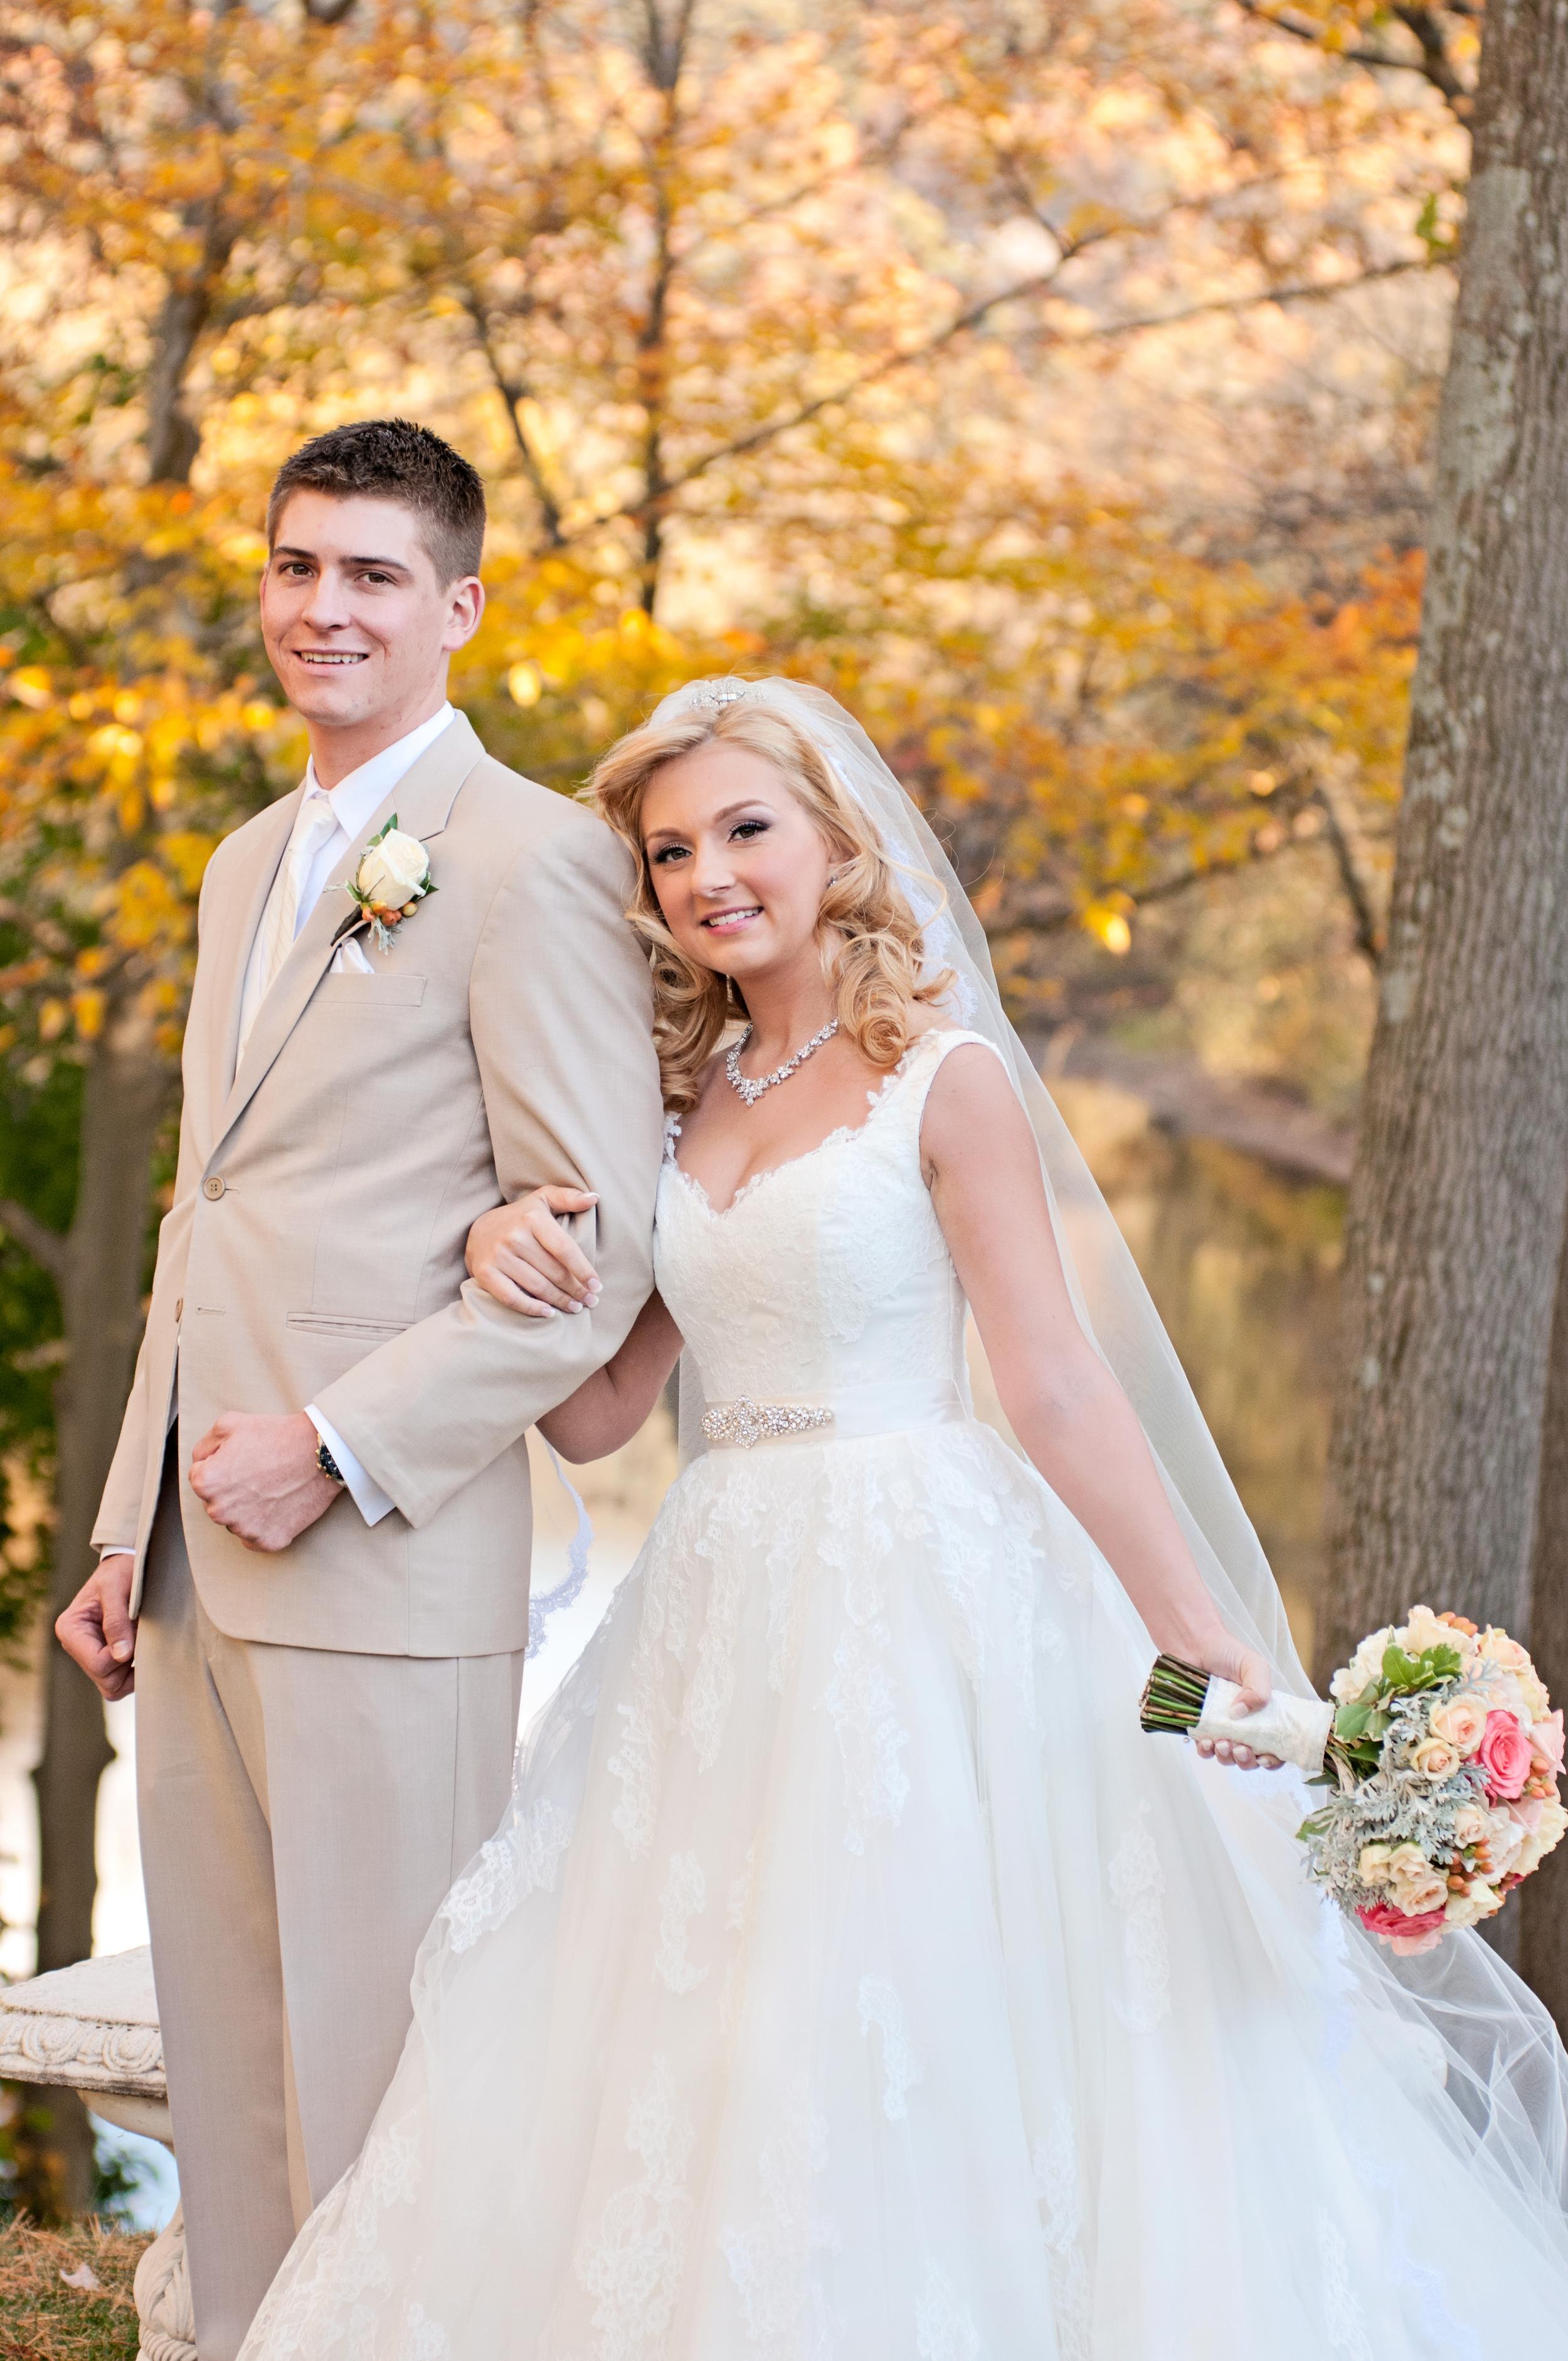 Angela_Chicoski_CT_wedding_photographer_083.jpg